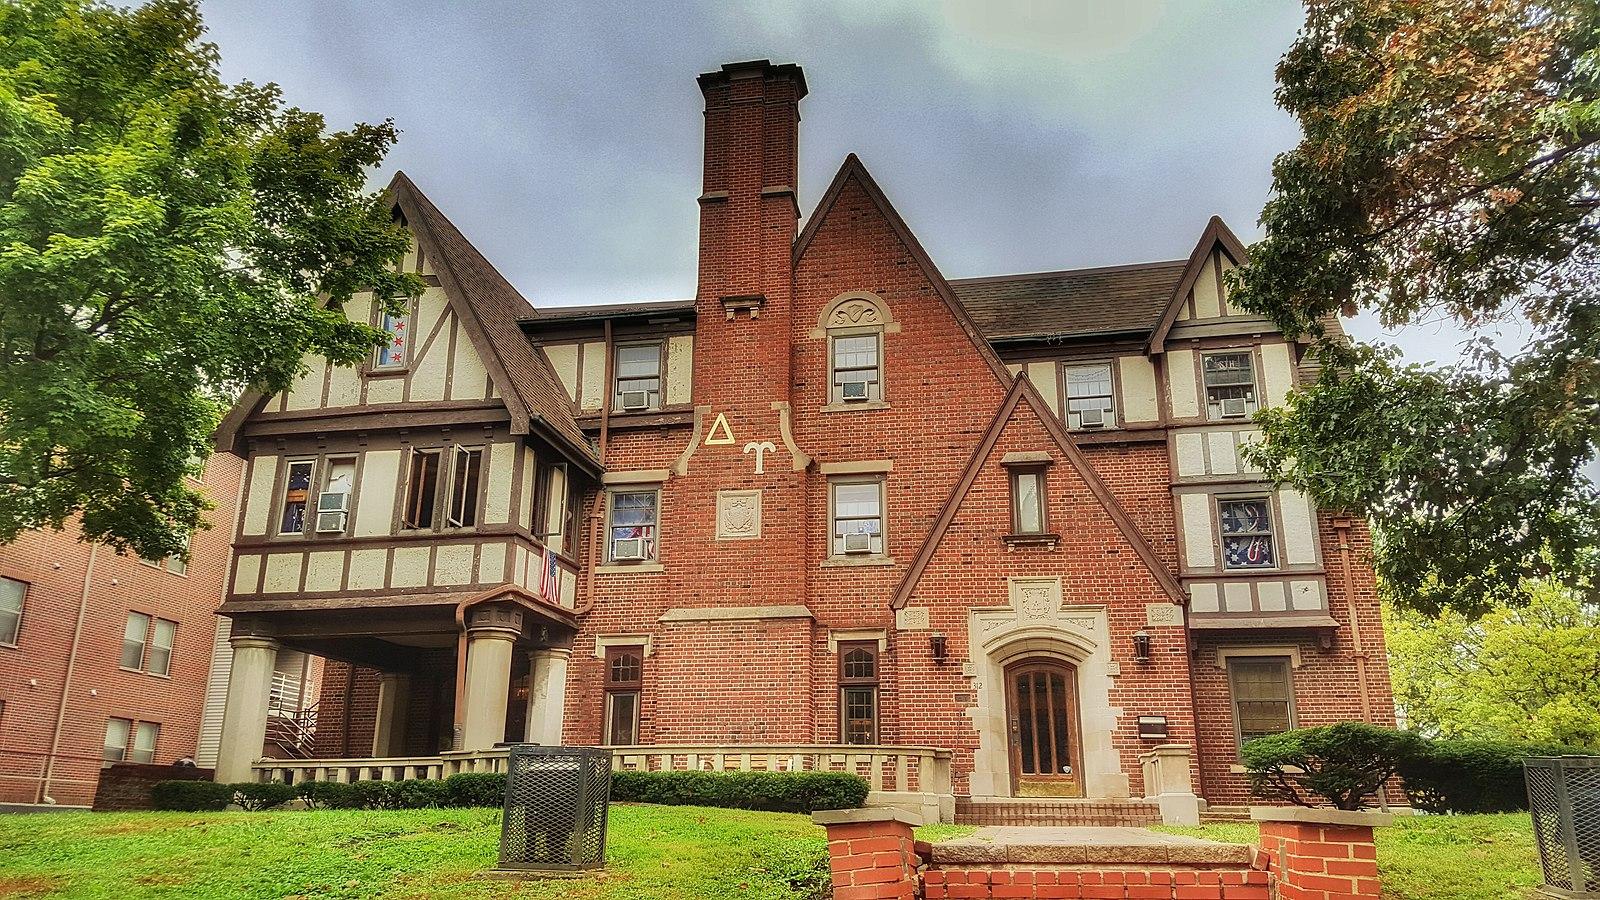 Delta Upsilon Fraternity House by Killivalavan Solai